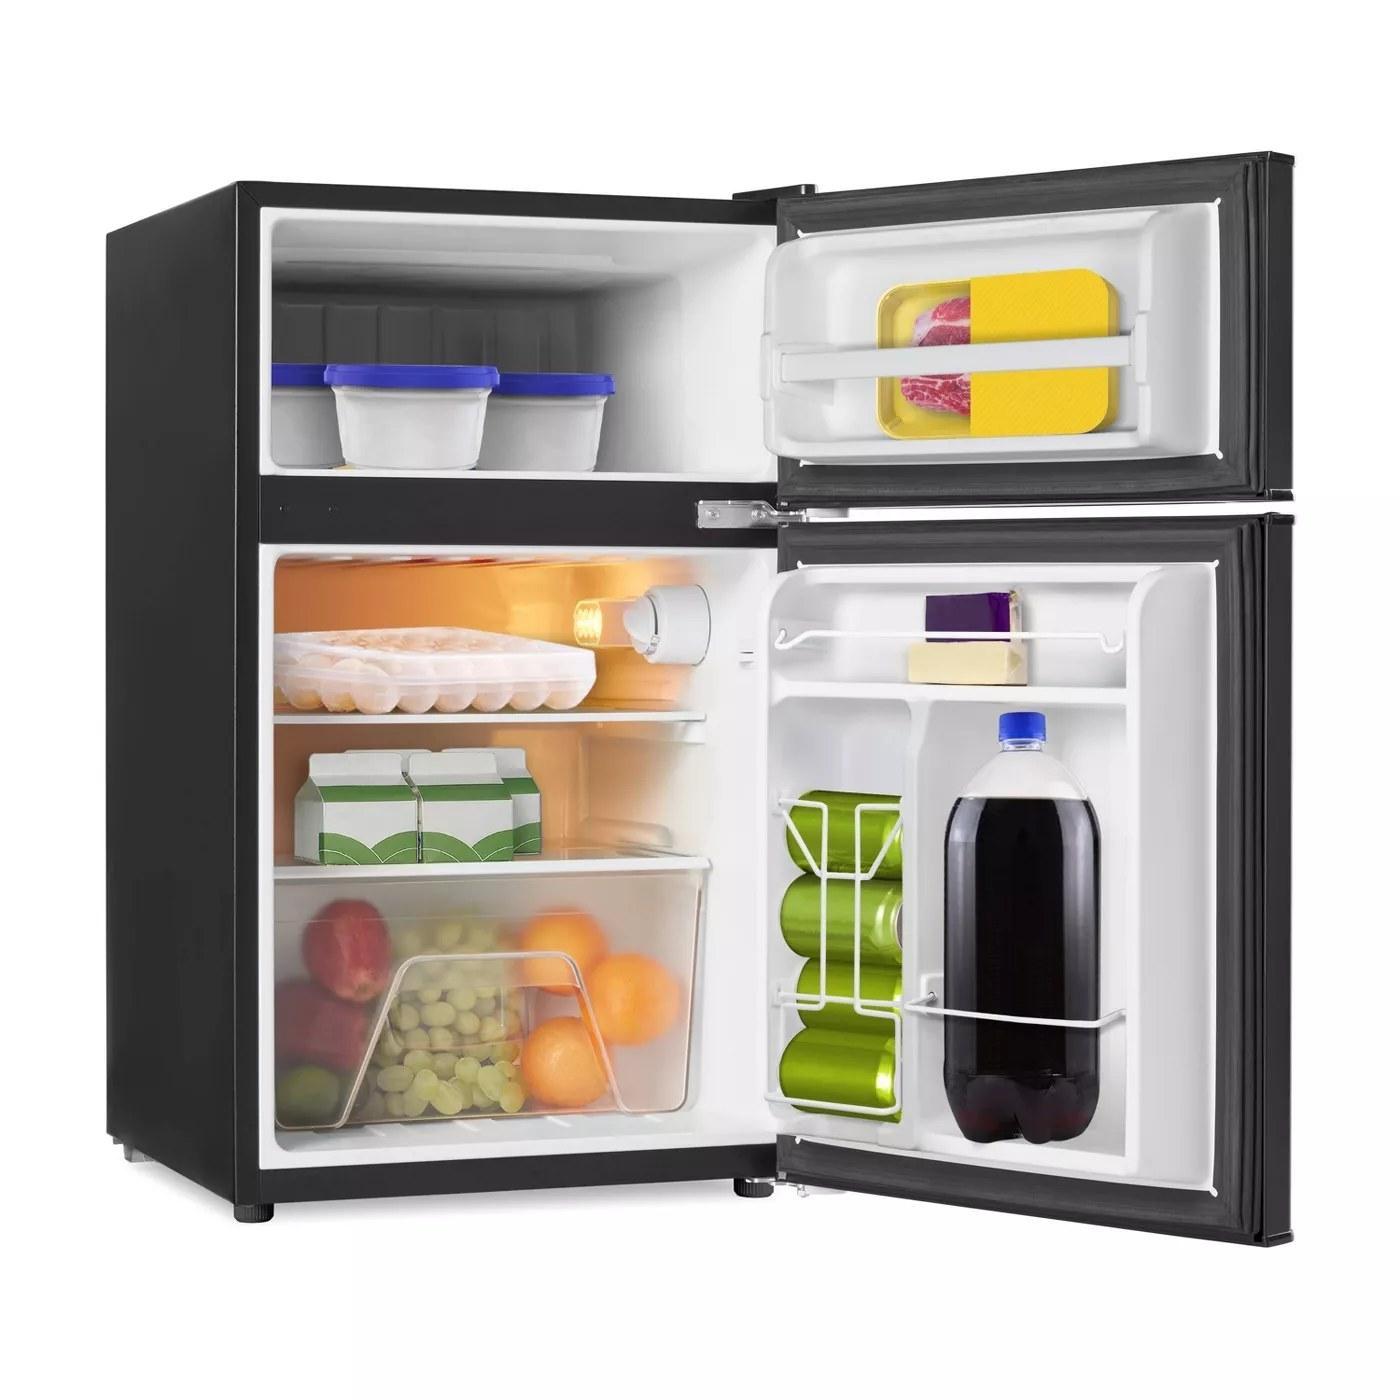 The interior of the mini fridge and freezer